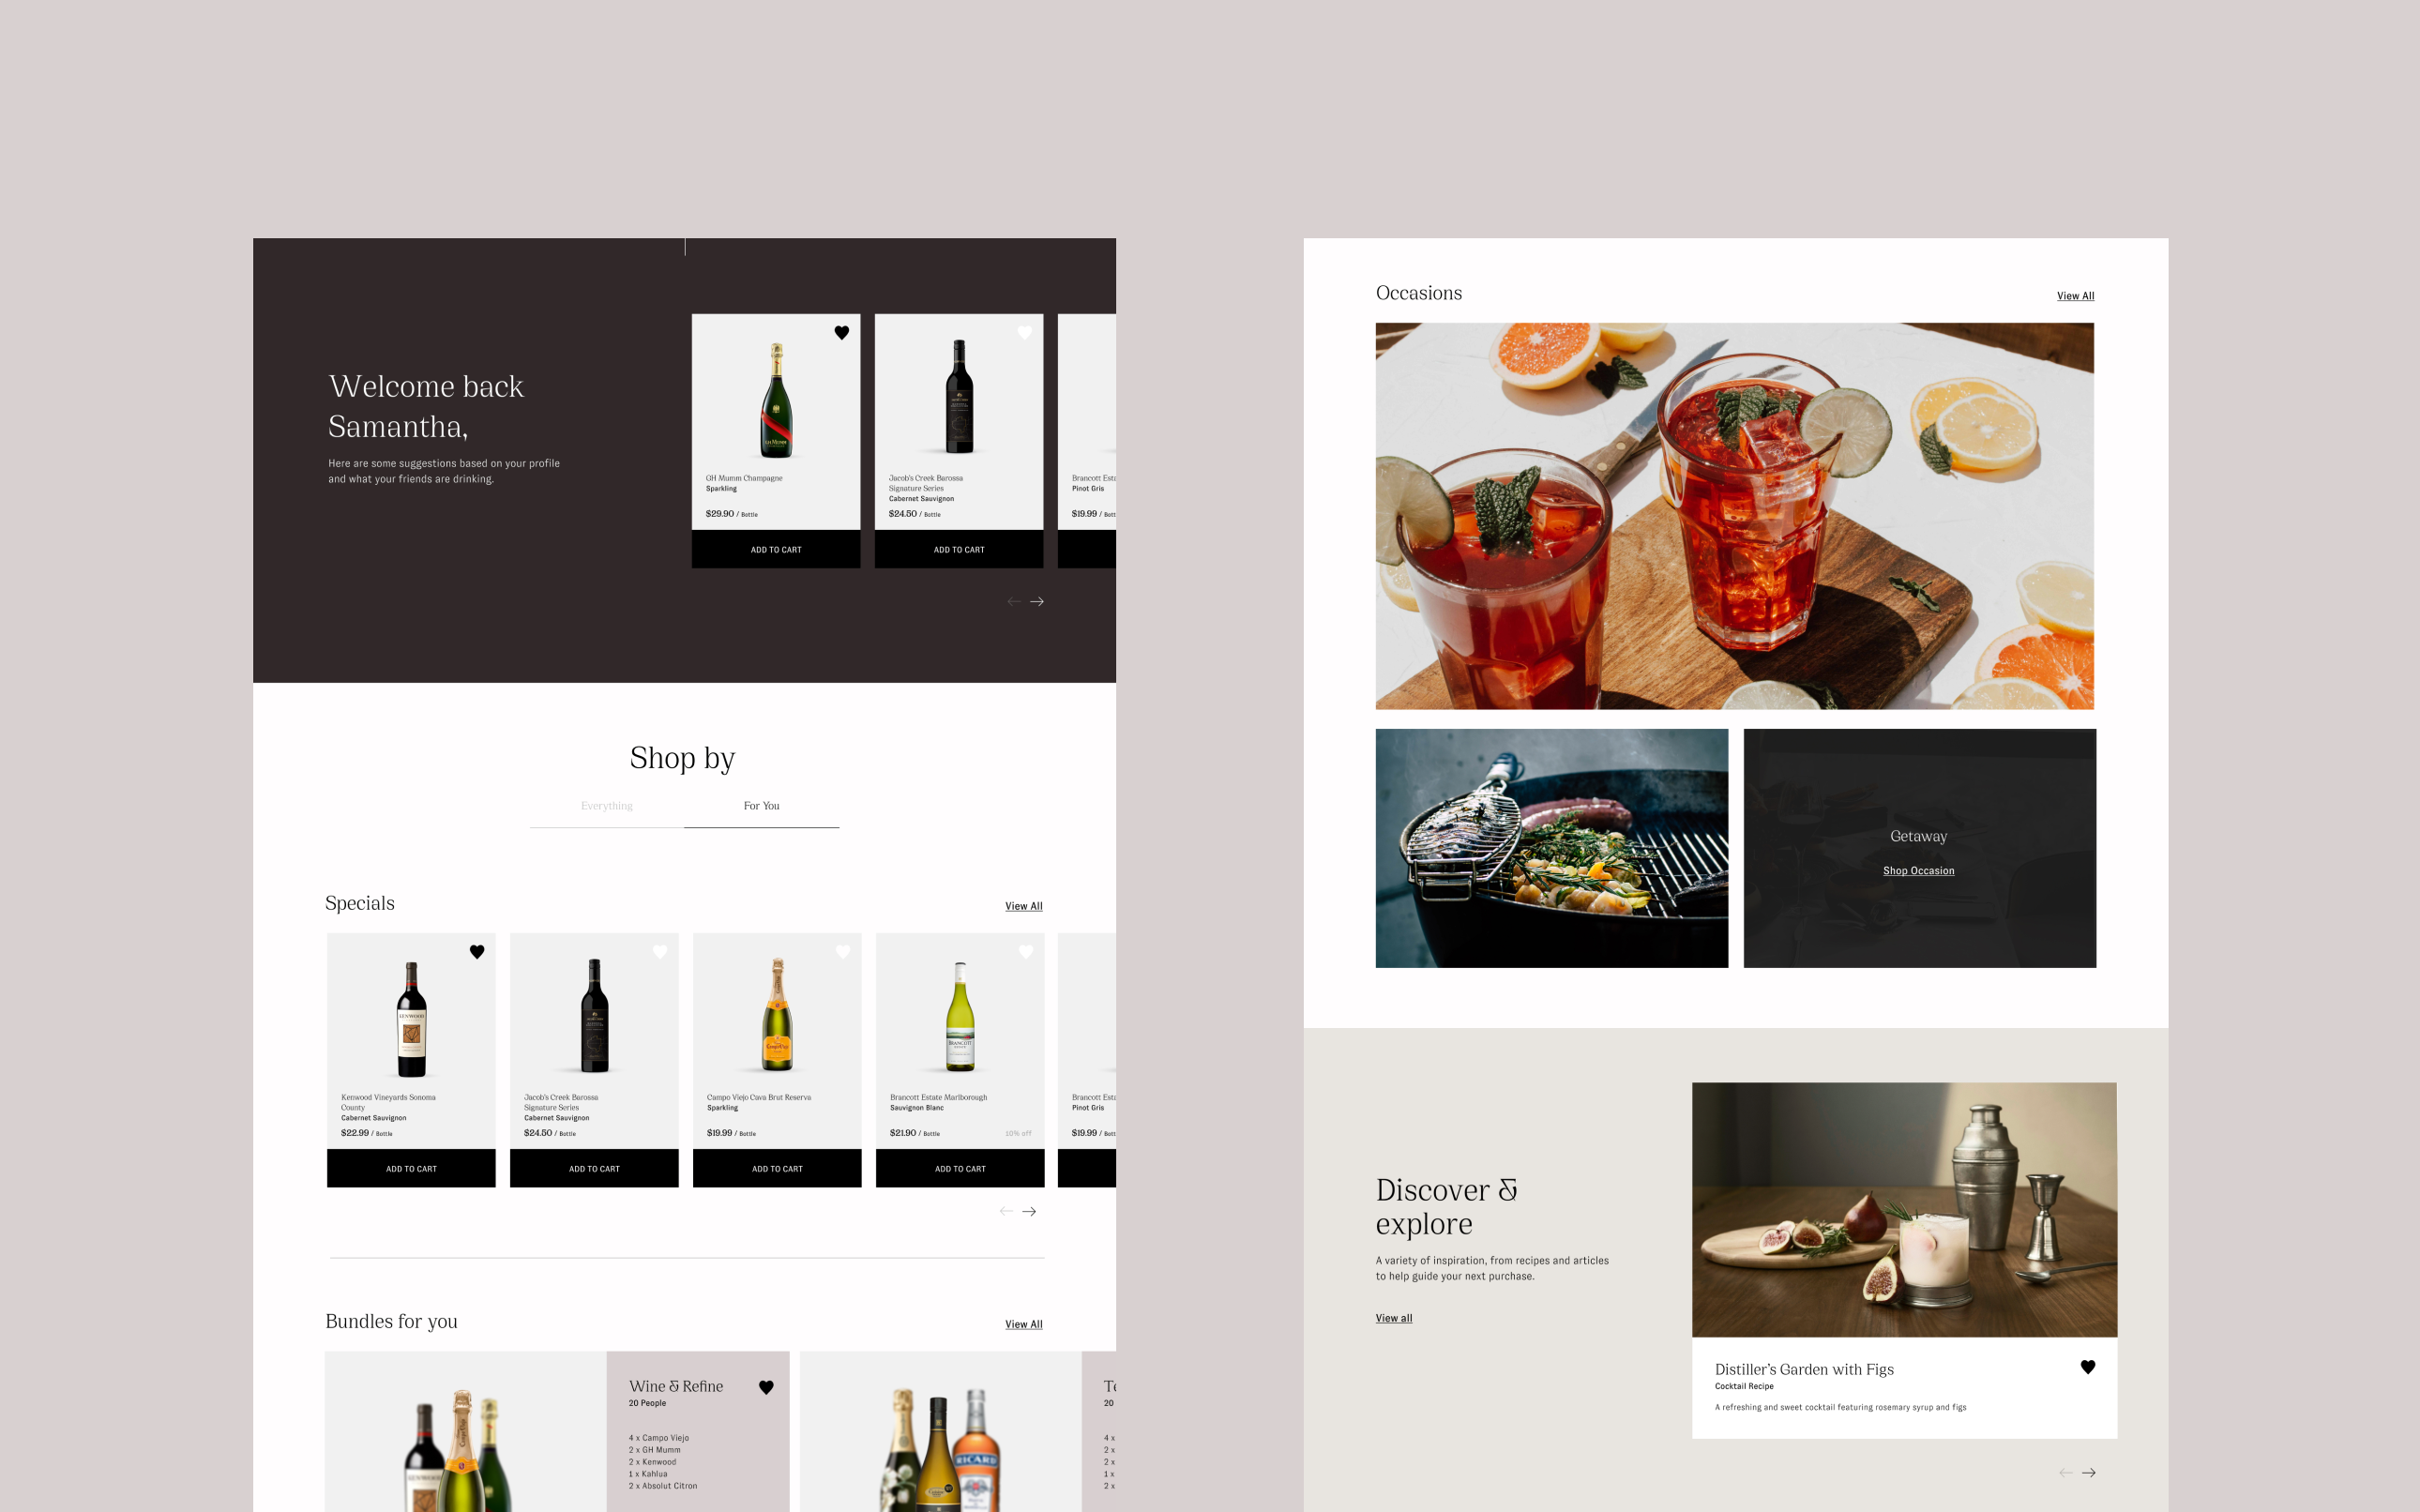 Henry & Paul desktop website screenshots, showcasing various imagery modules